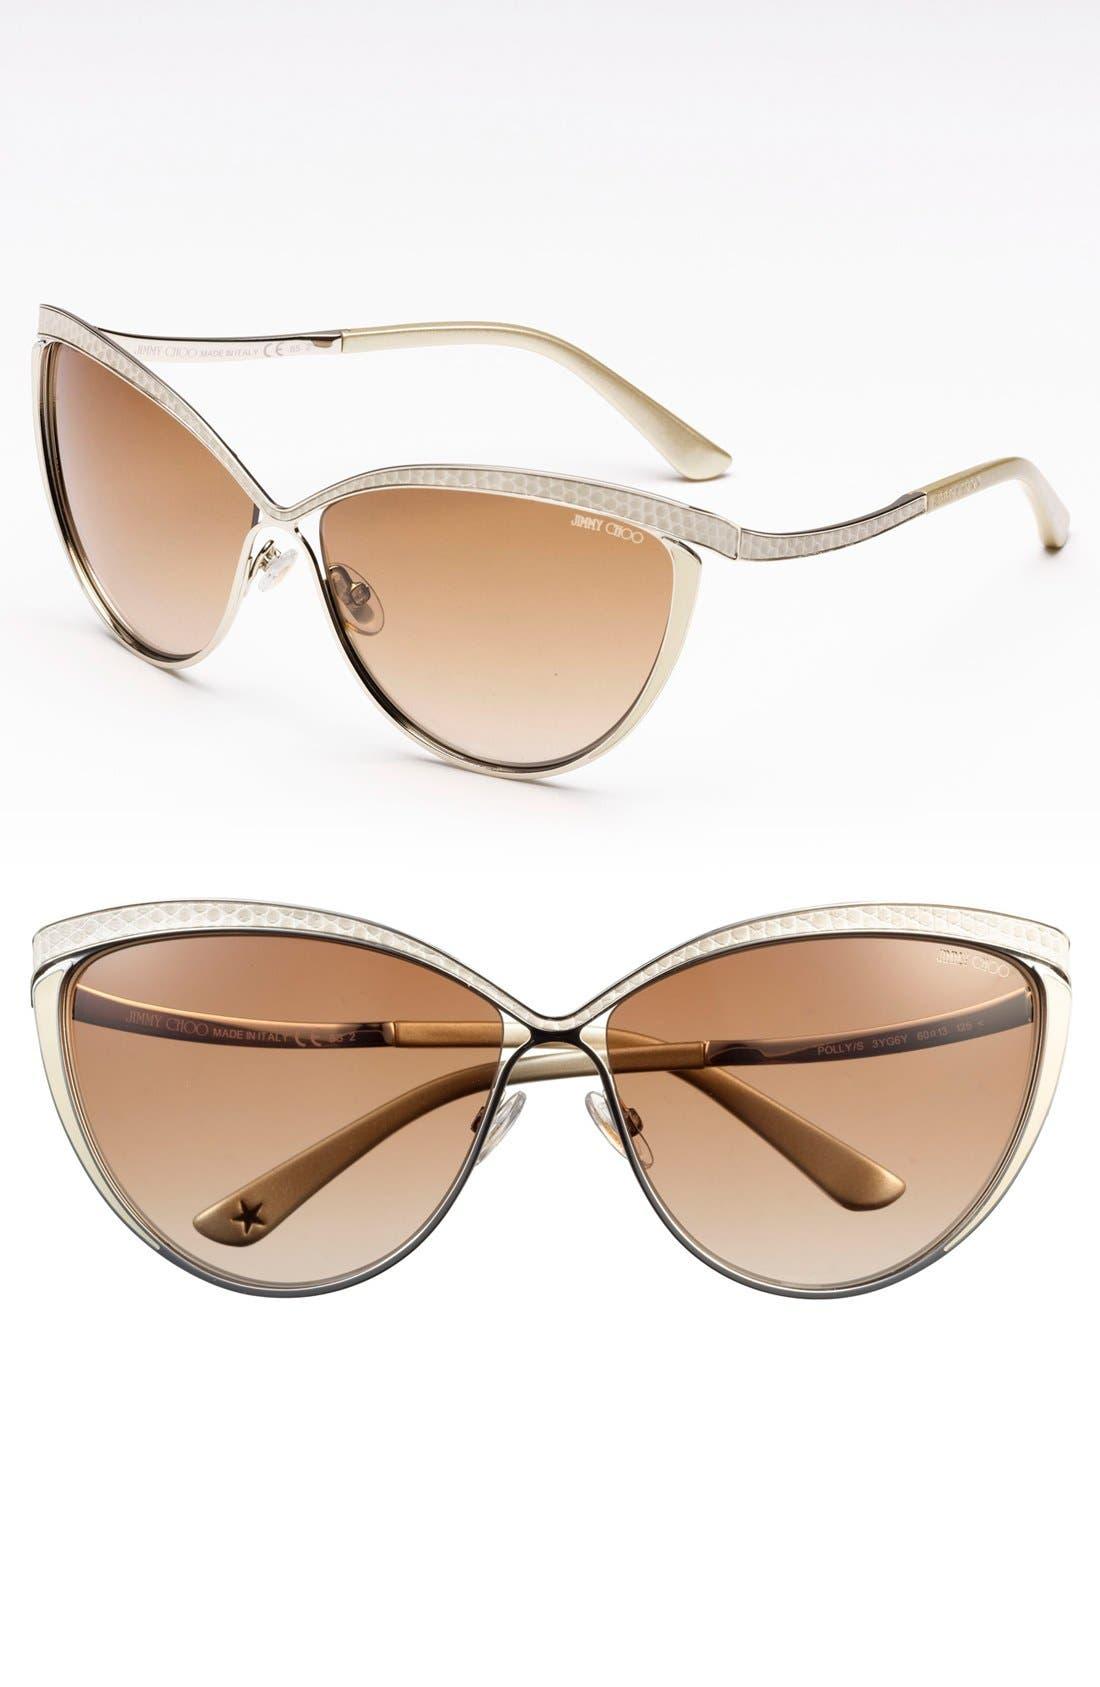 Main Image - Jimmy Choo 60mm Retro Sunglasses